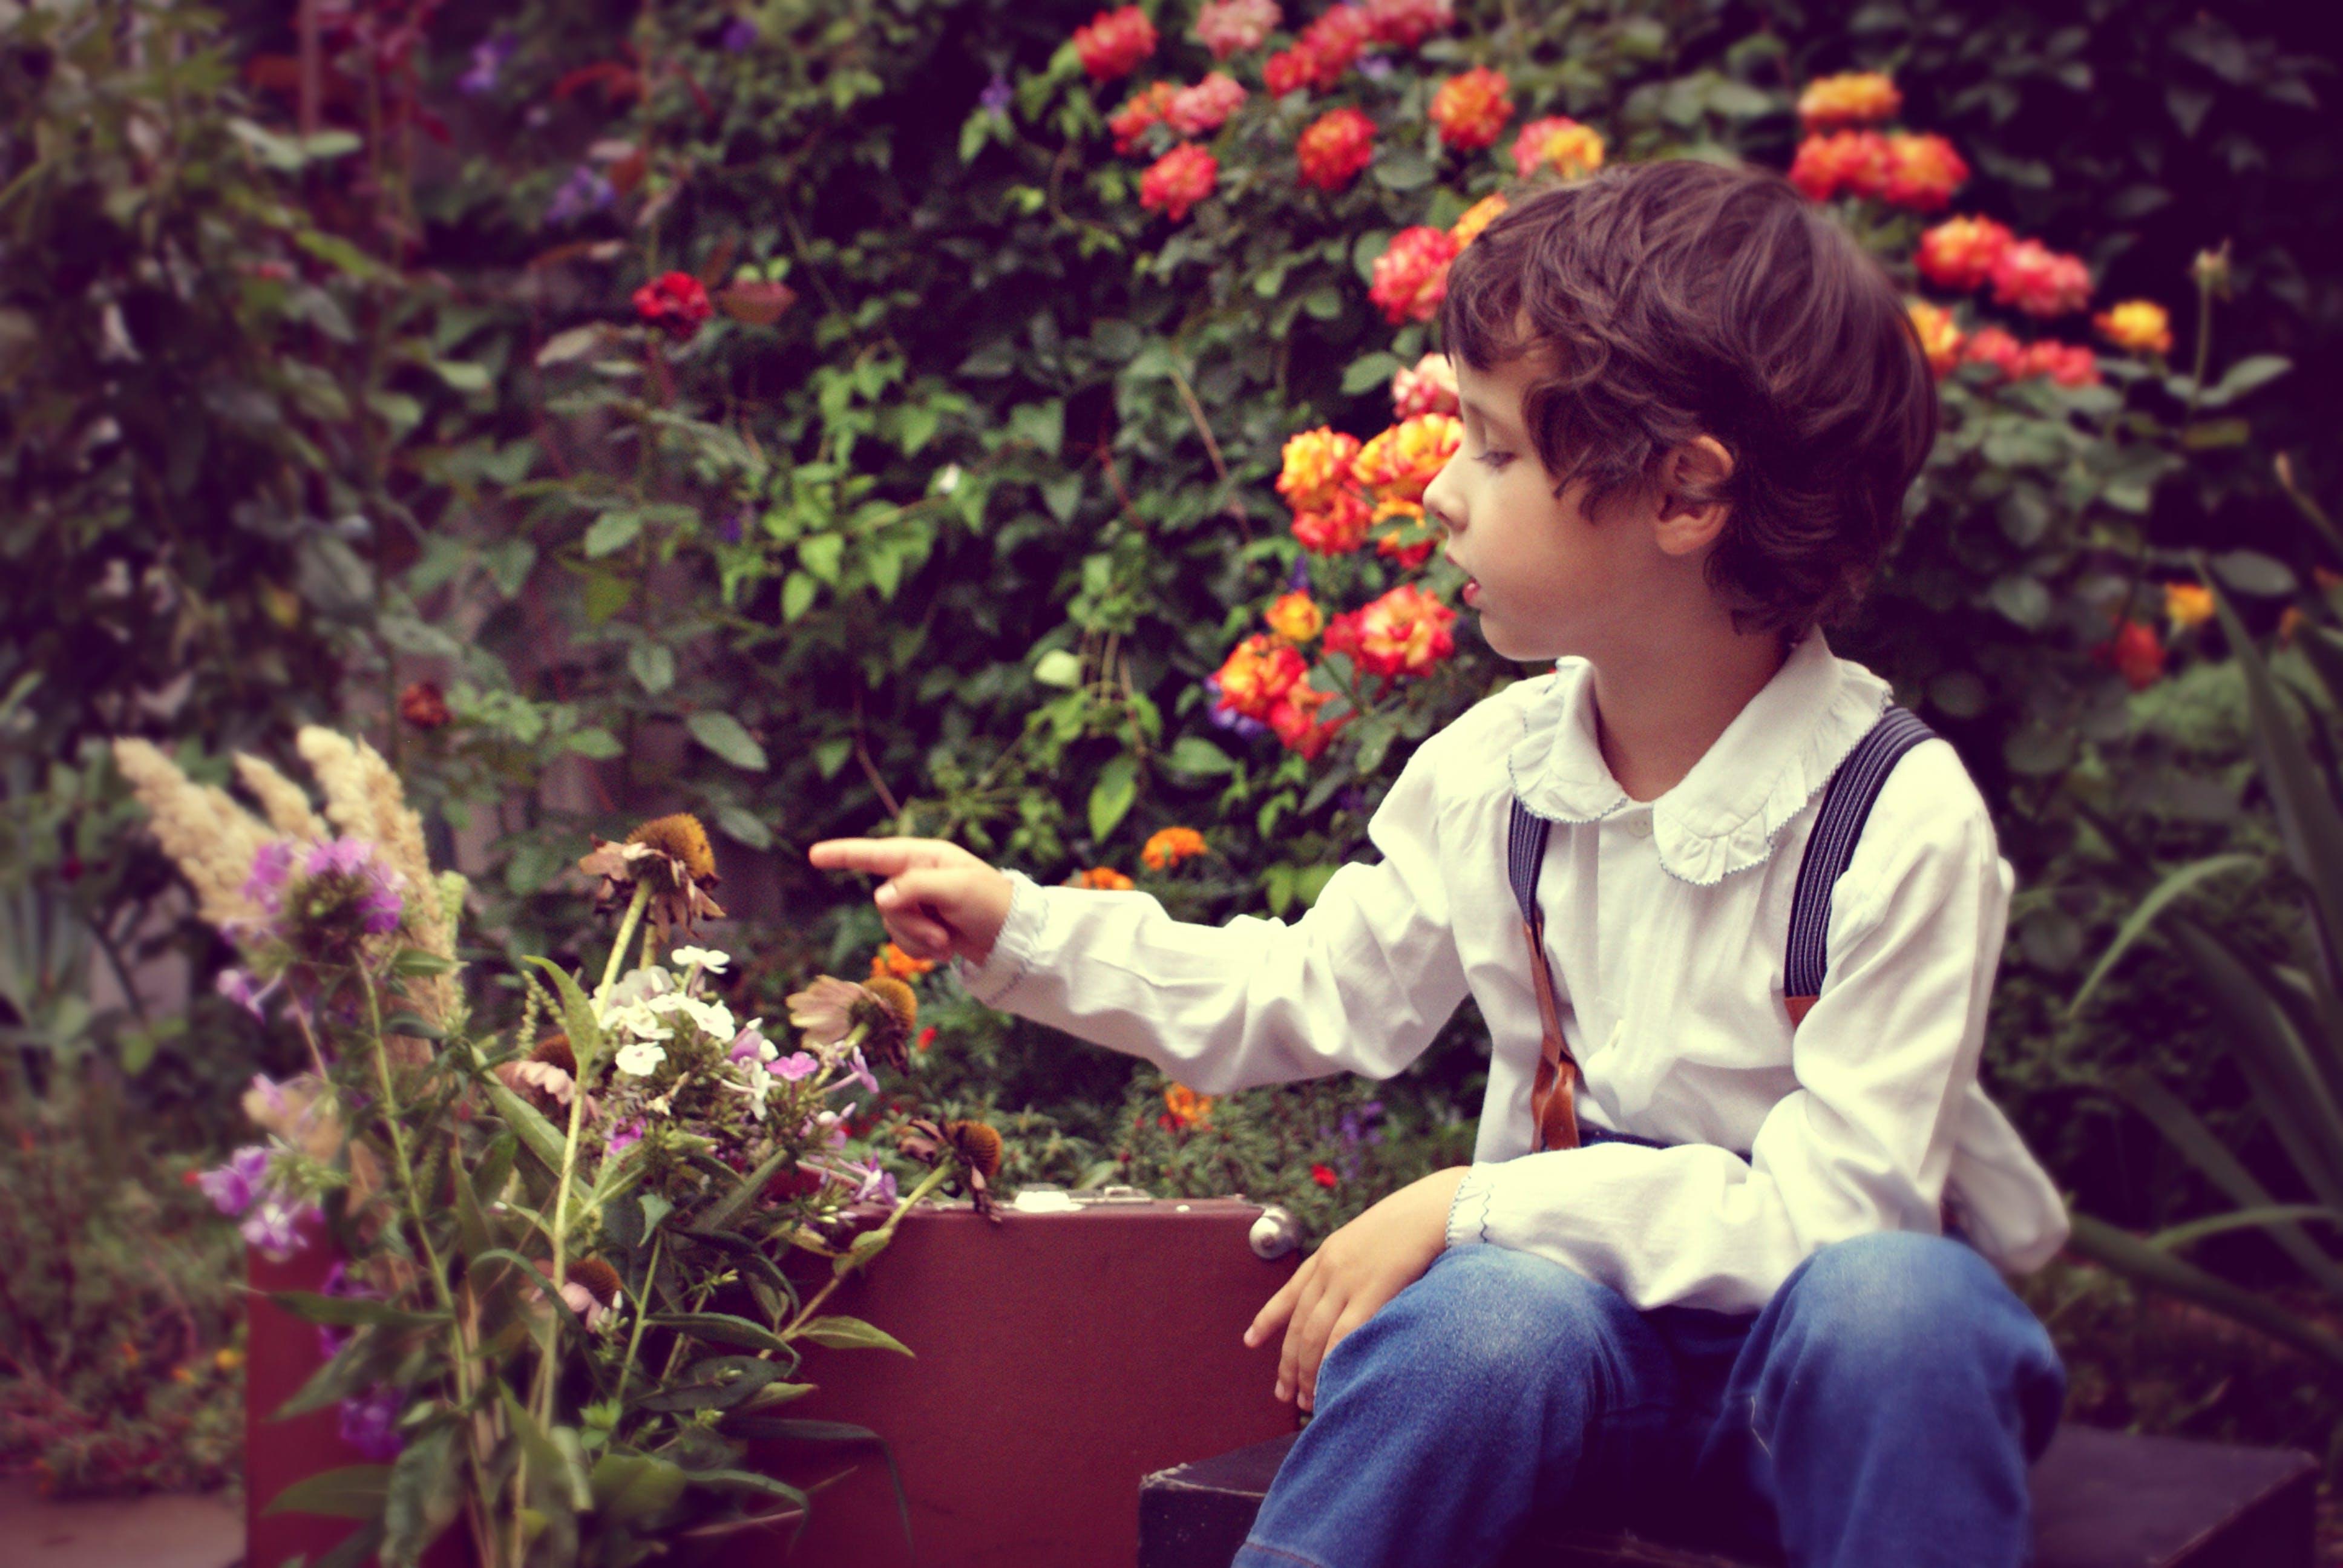 ansigtsudtryk, barn, blomst